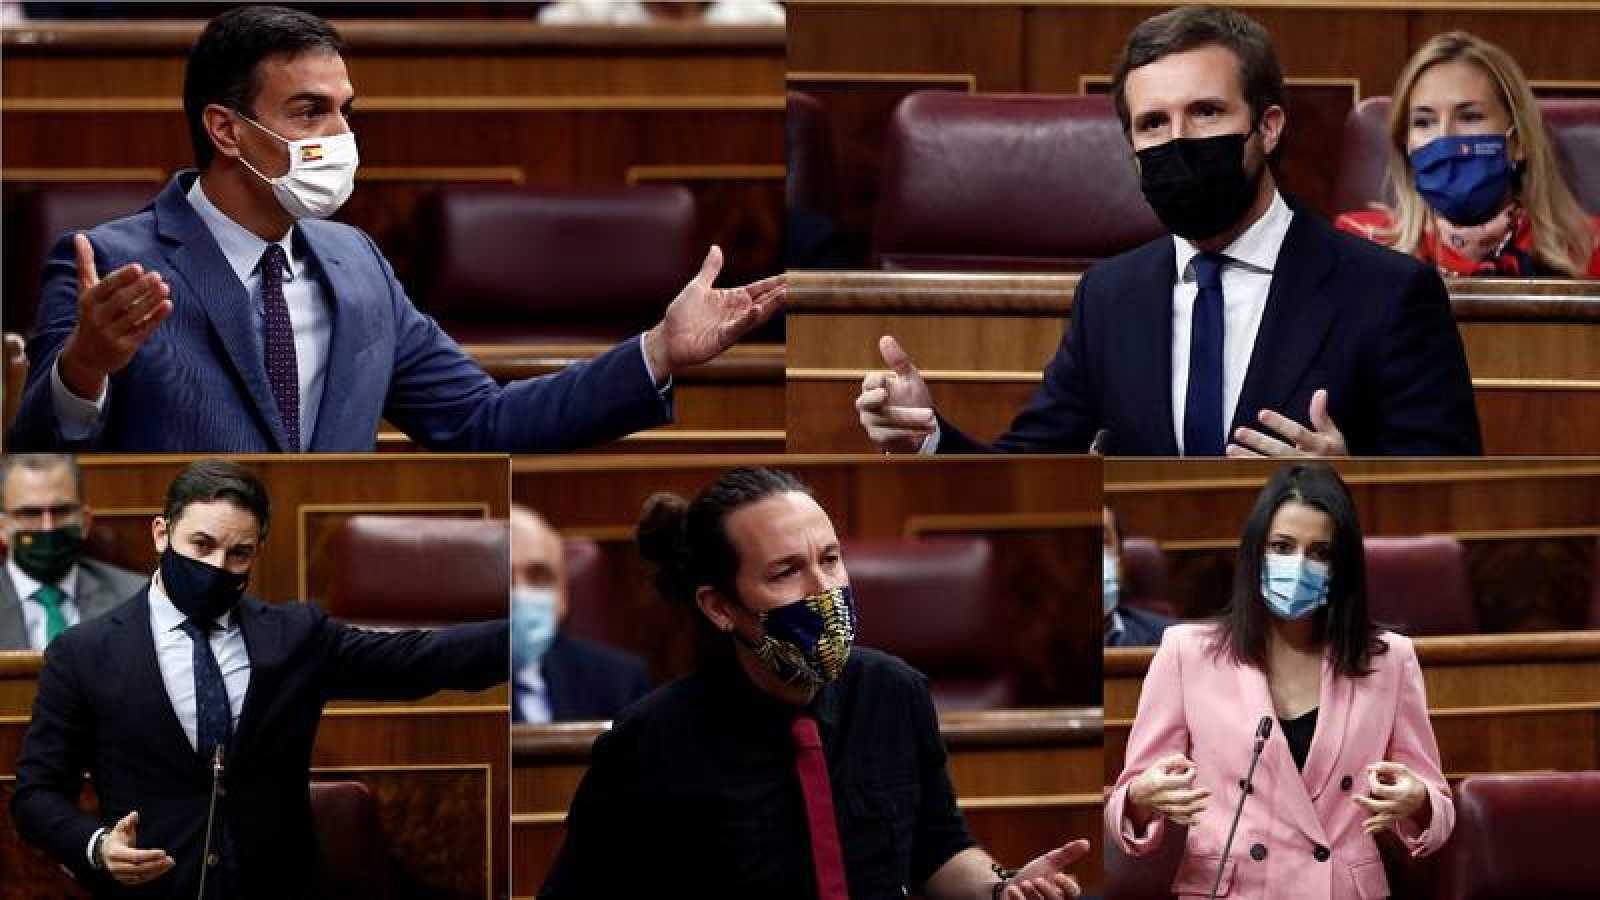 Pedro Sánchez, Pablo Casado, Santiago Abascal, Pablo Iglesias e Inés Arrimadas, en sesión de control en el Congreso.